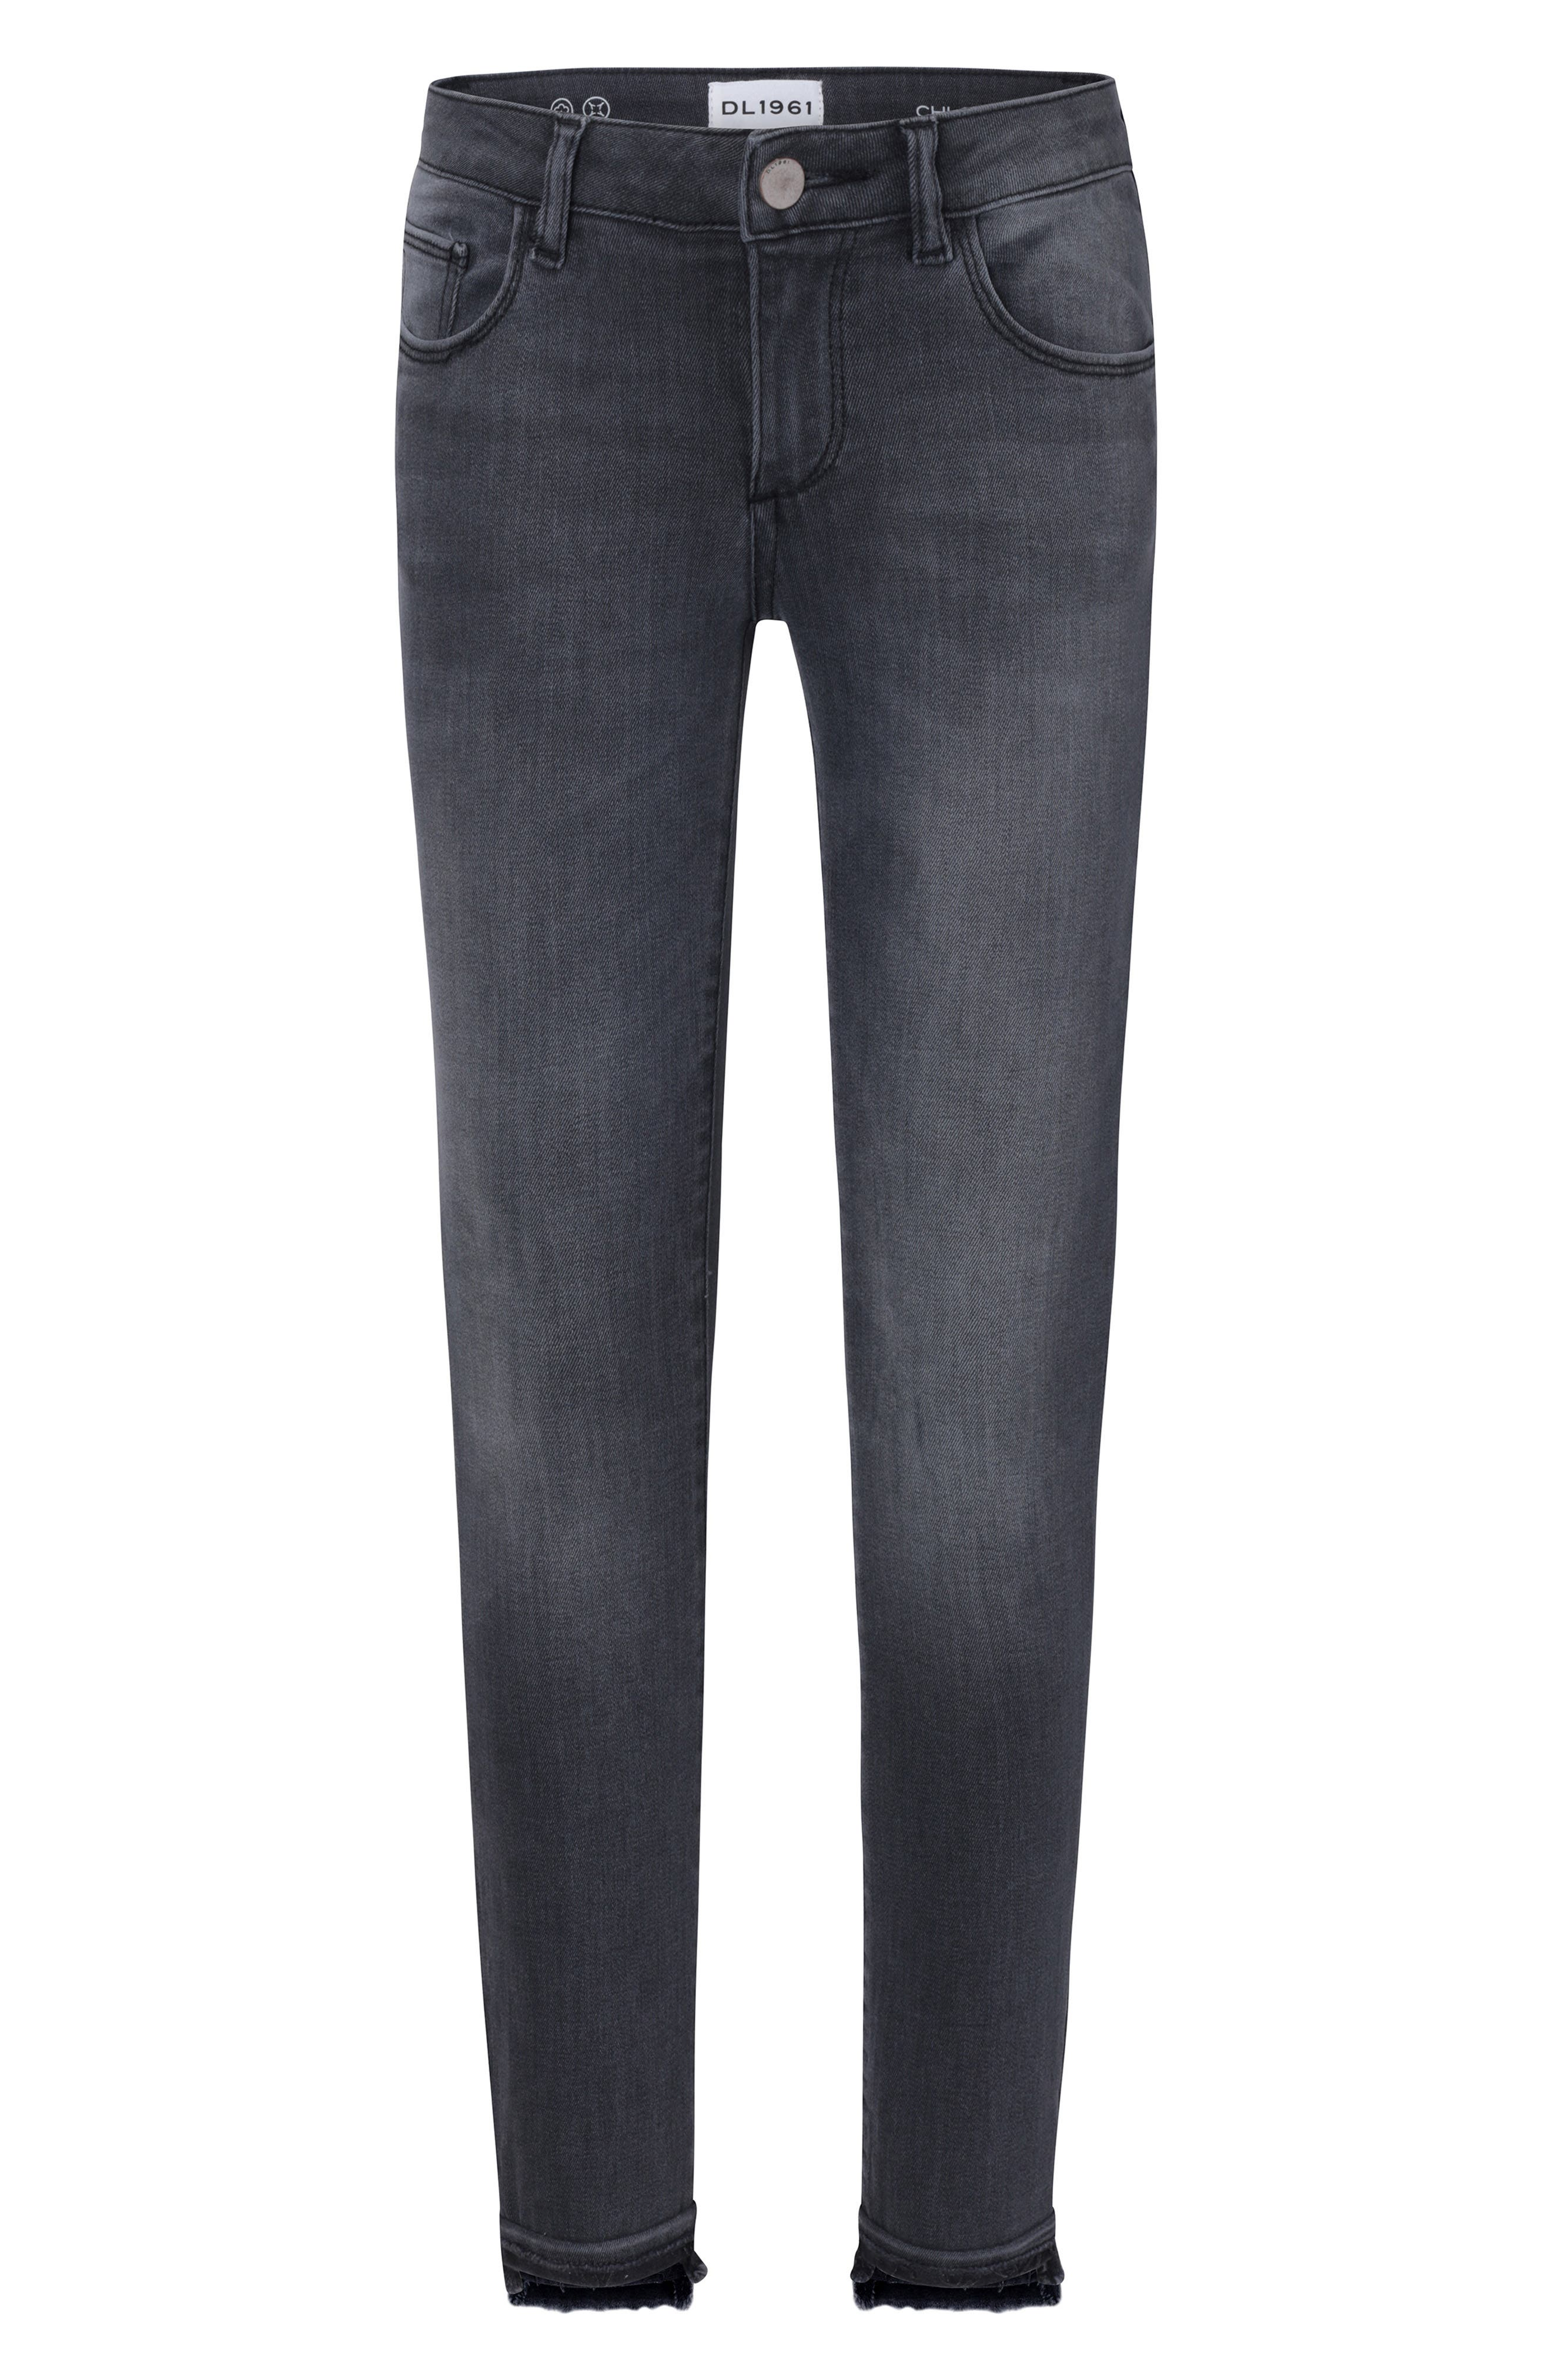 Chloe Released Step Hem Skinny Jeans,                         Main,                         color, STORMY